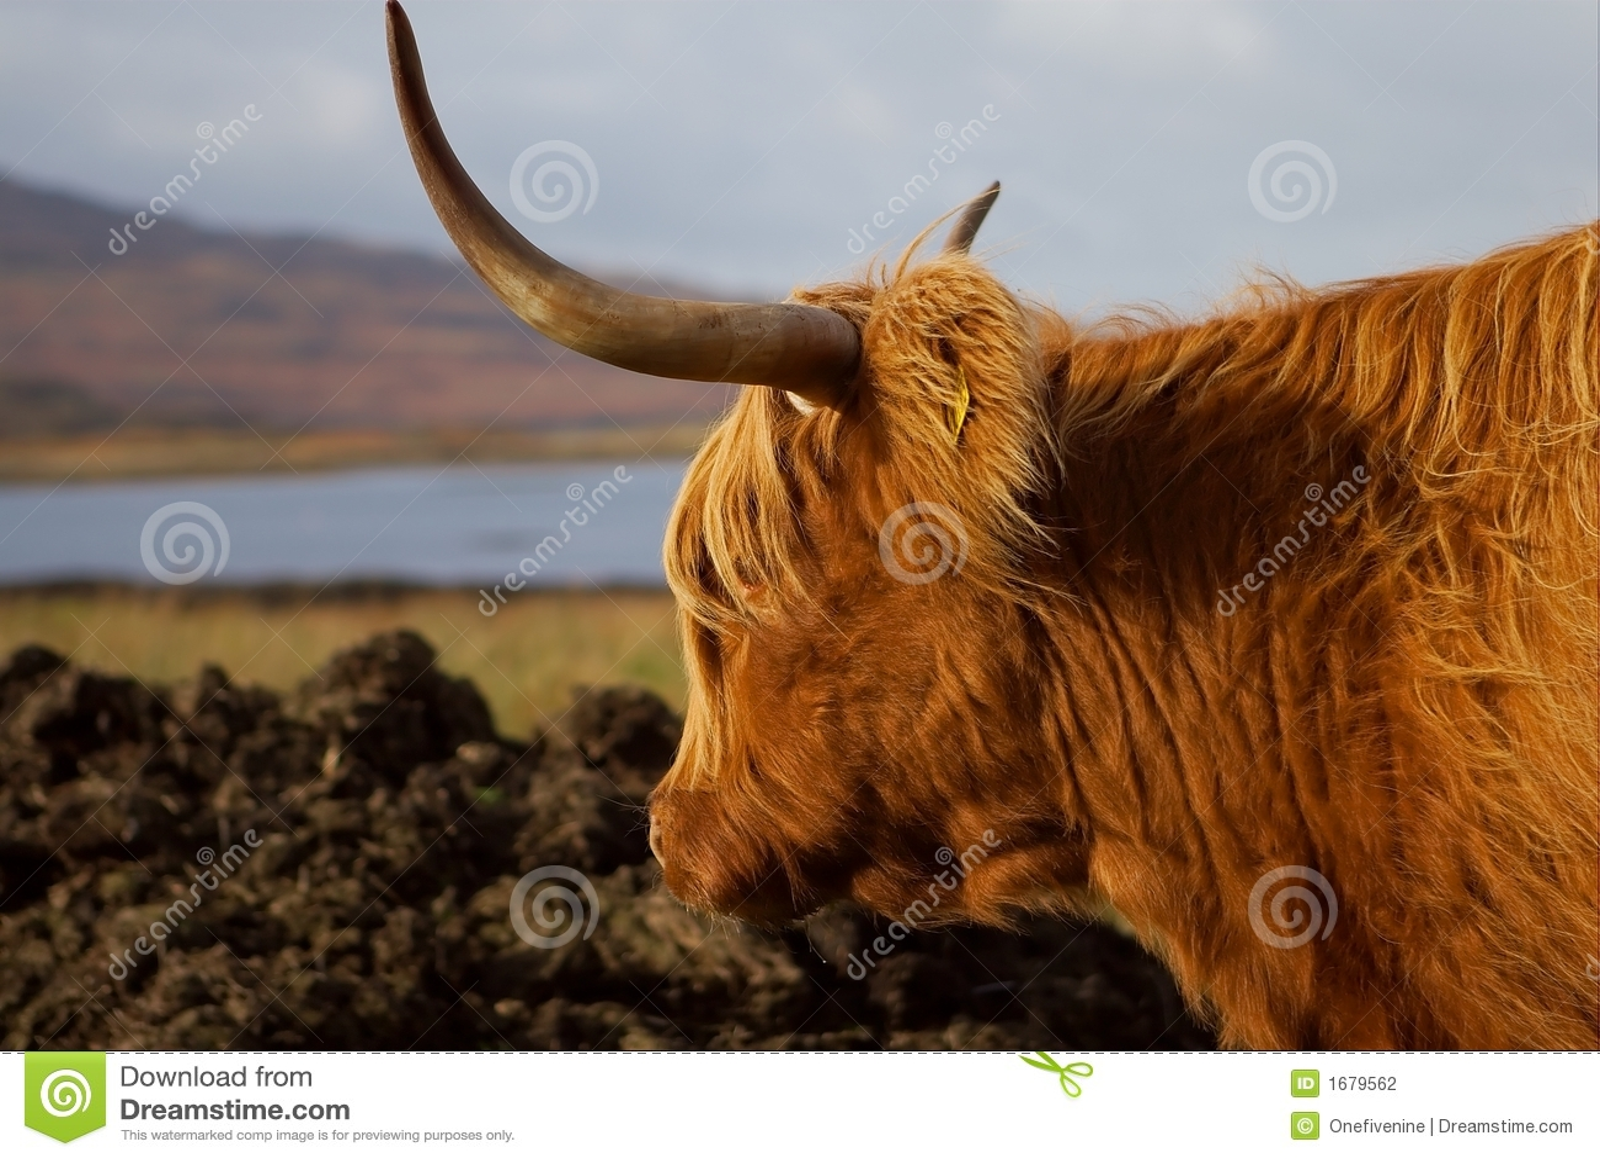 Mull Highland Cow